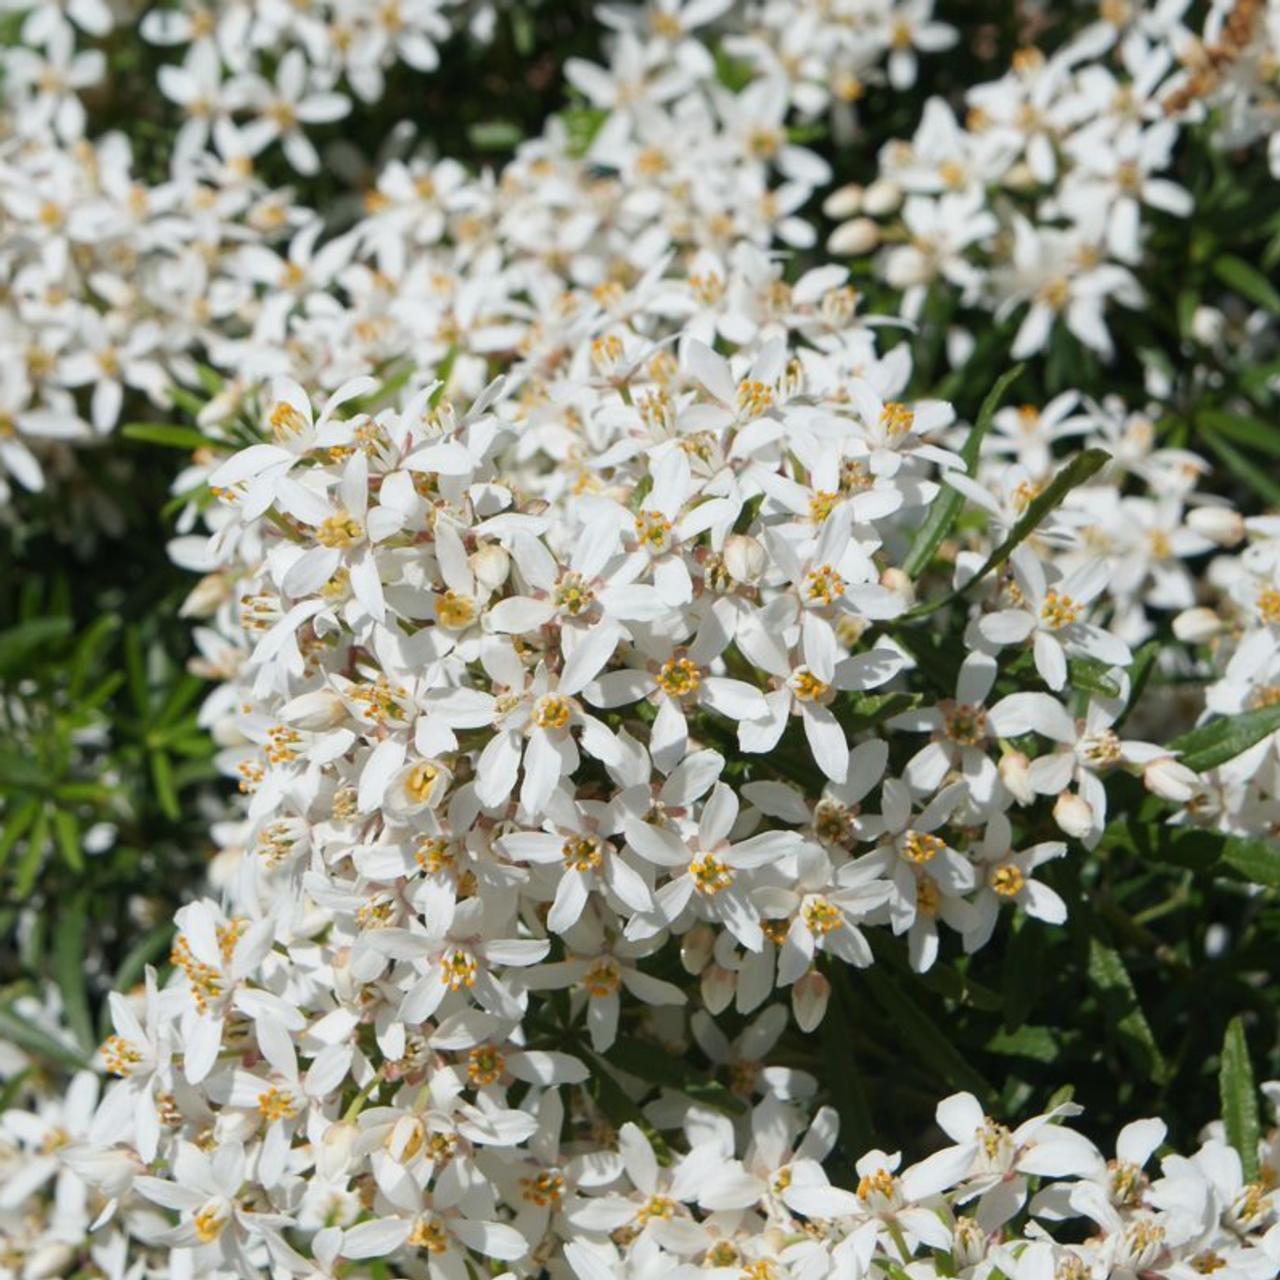 Choisya ternata 'White Dazzler' plant